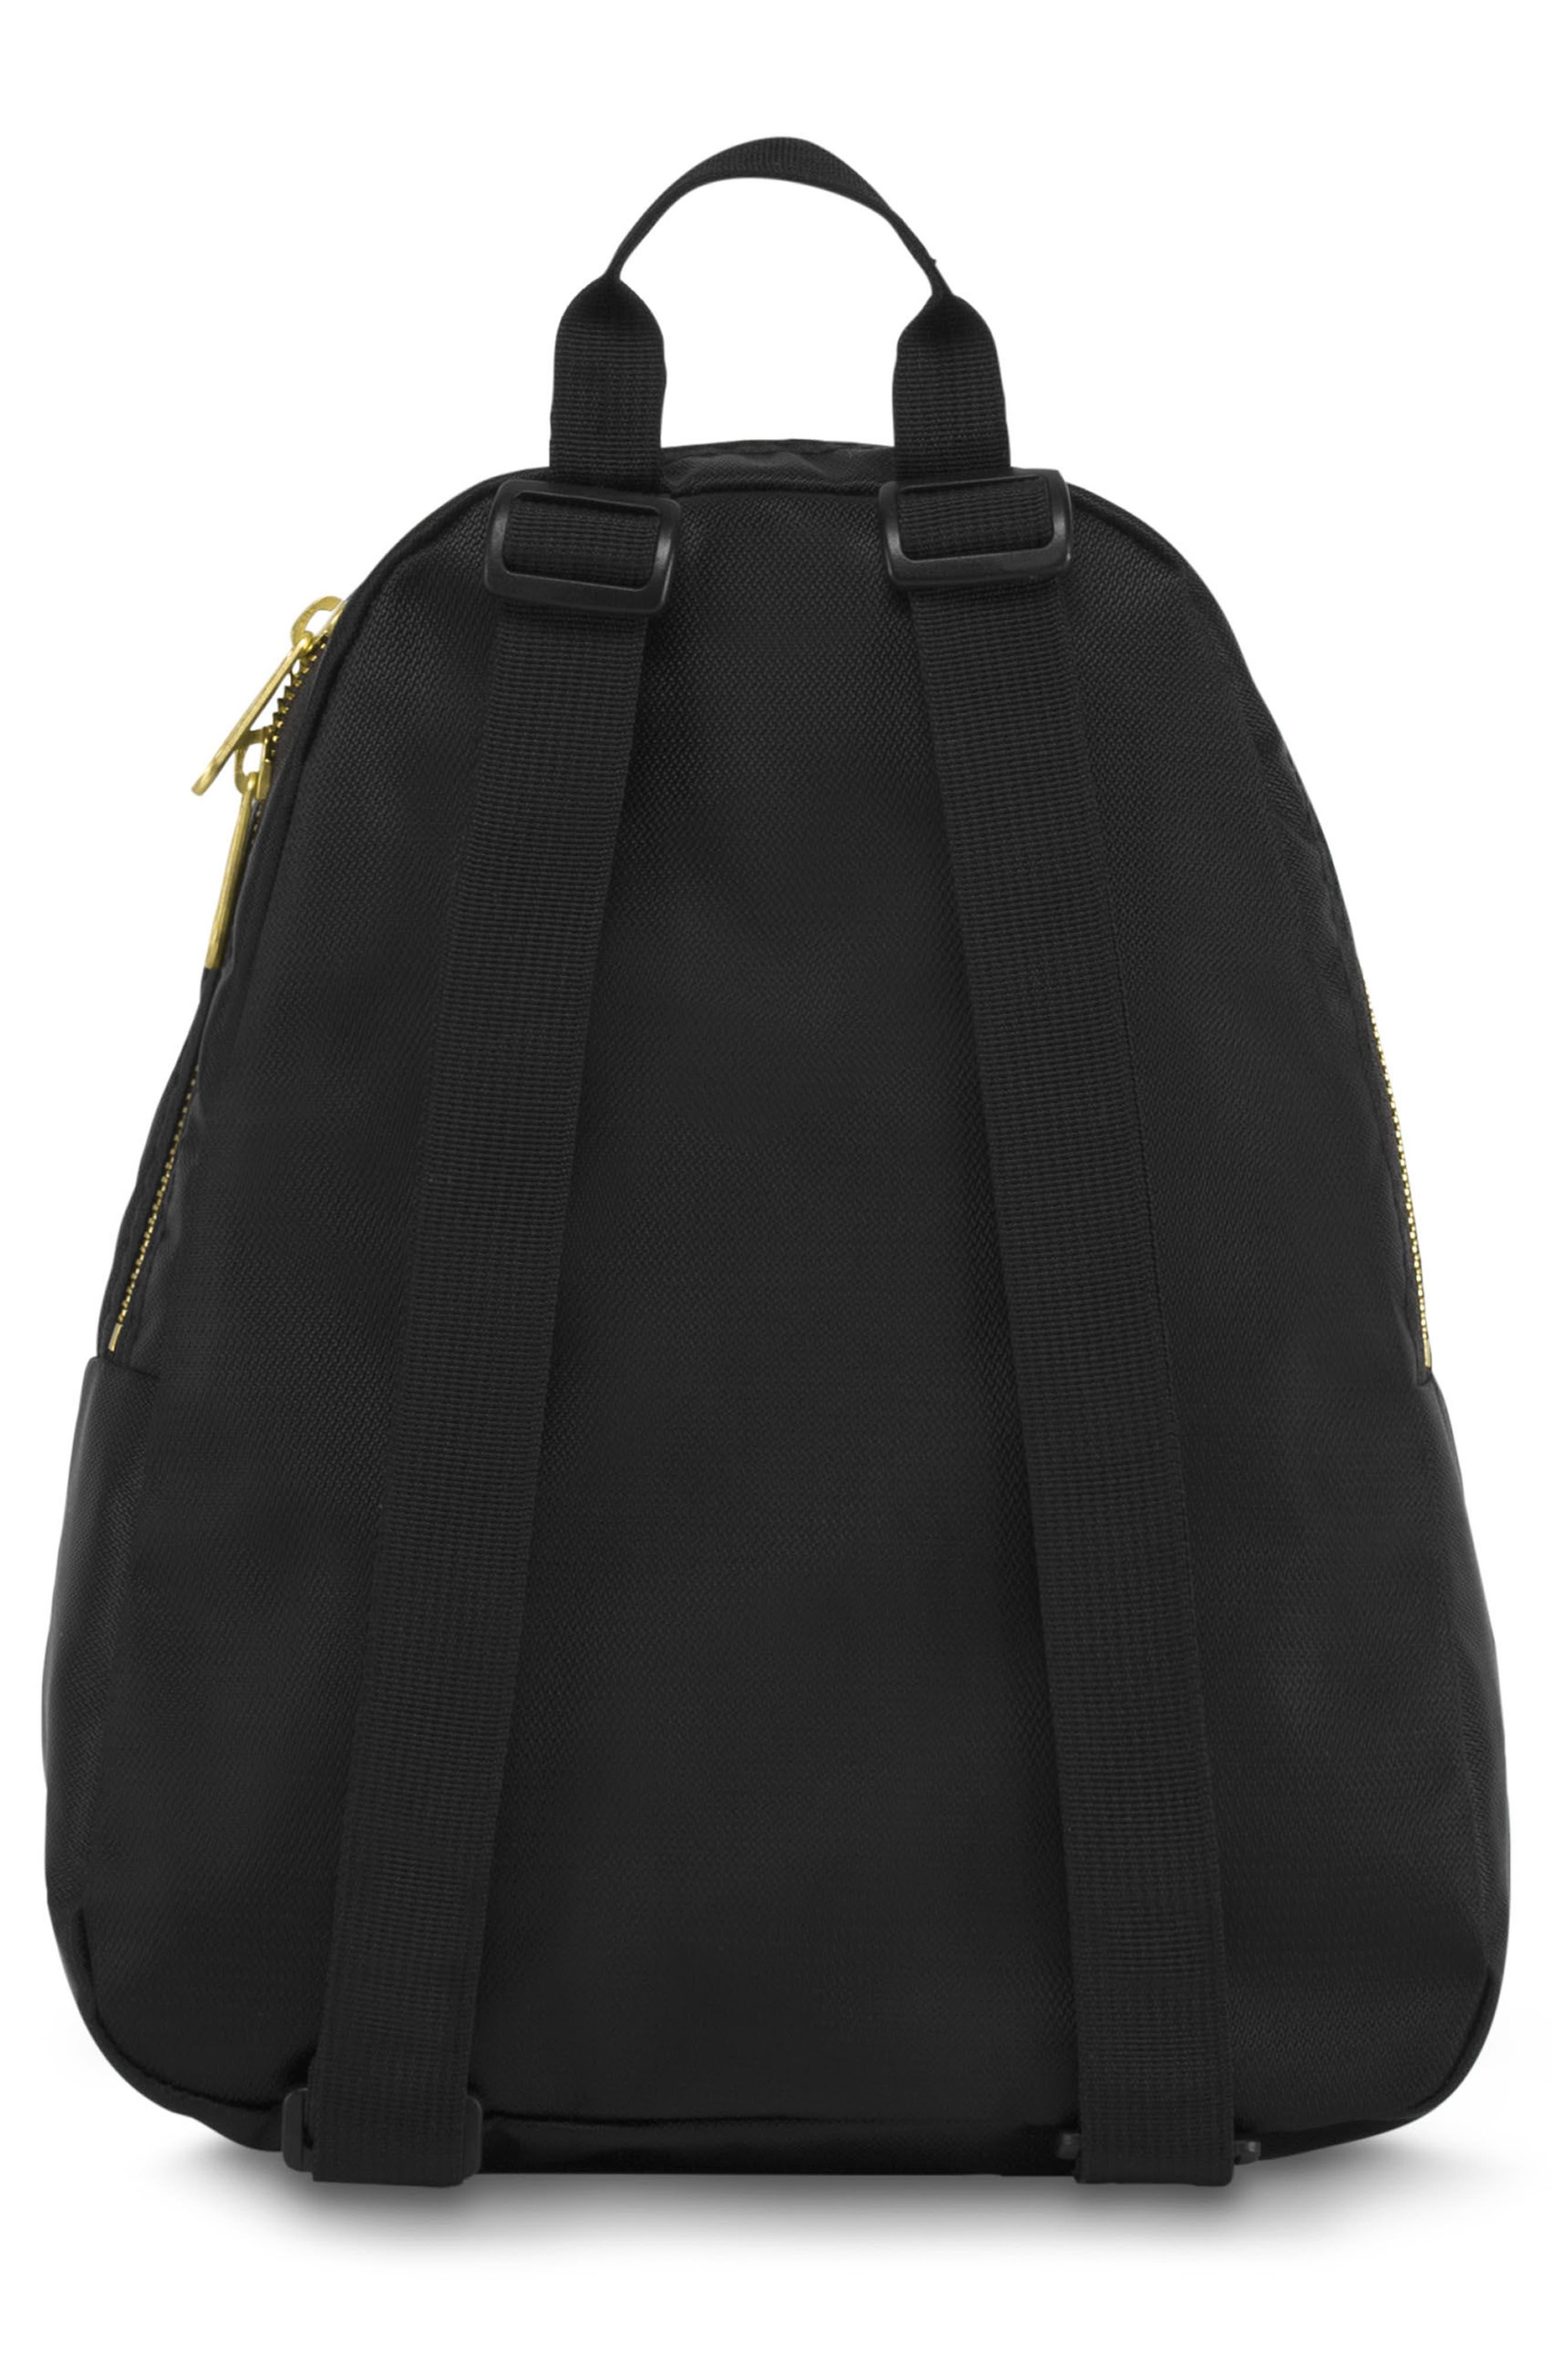 Half Pint FX Backpack,                             Alternate thumbnail 3, color,                             BLACK GOLD